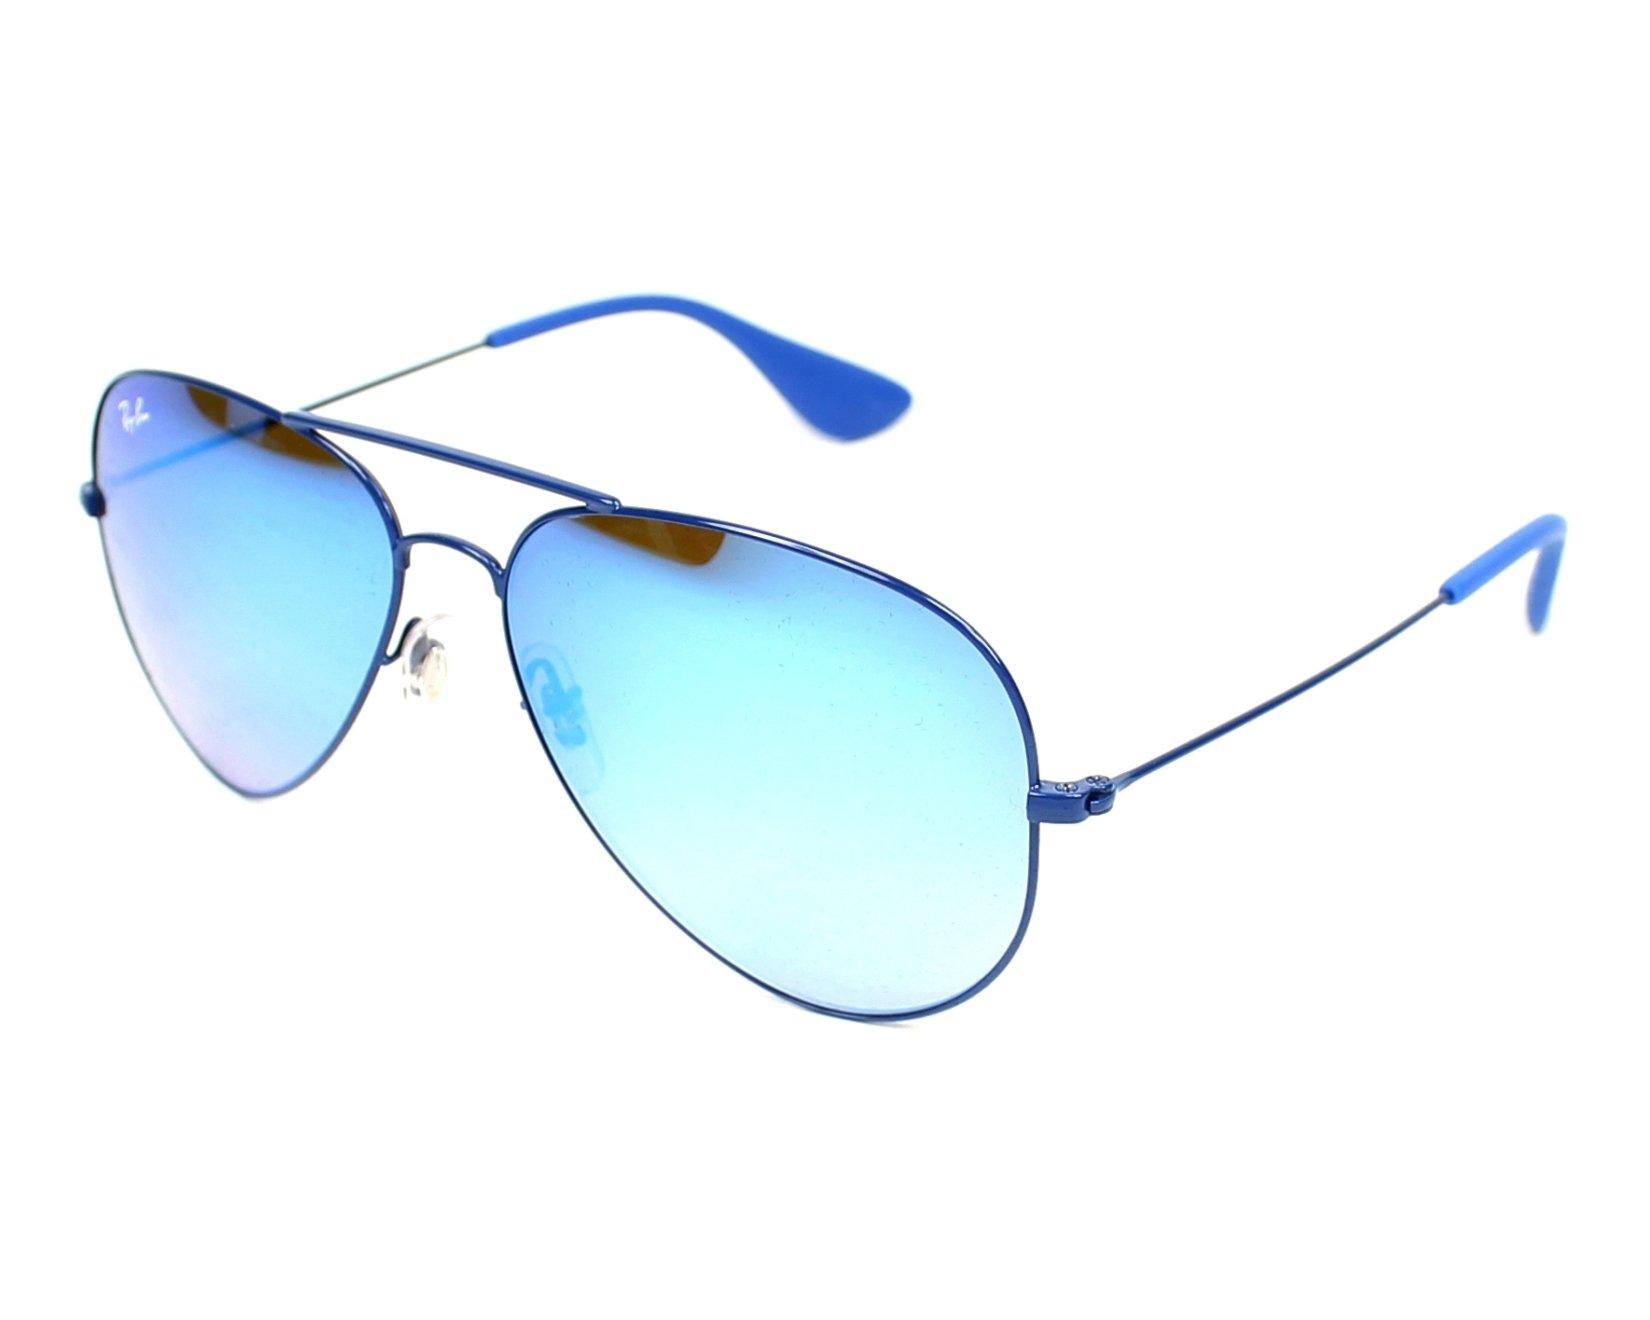 8c128663b86233 thumbnail Sunglasses Ray-Ban RB-3558 9016 B7 - Blue profile view